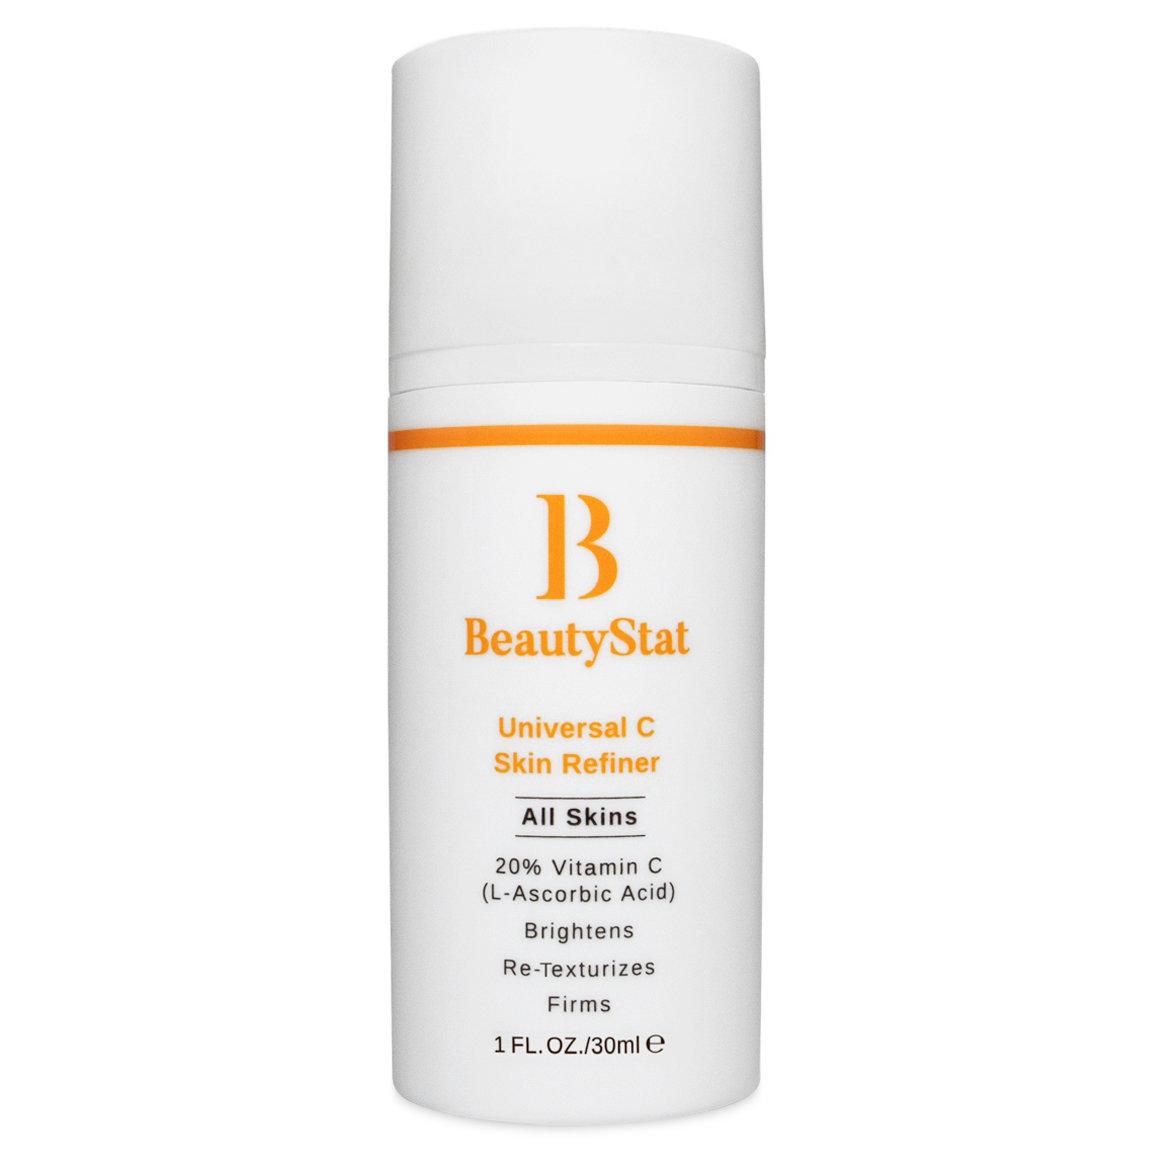 BeautyStat Universal C Skin Refiner alternative view 1.